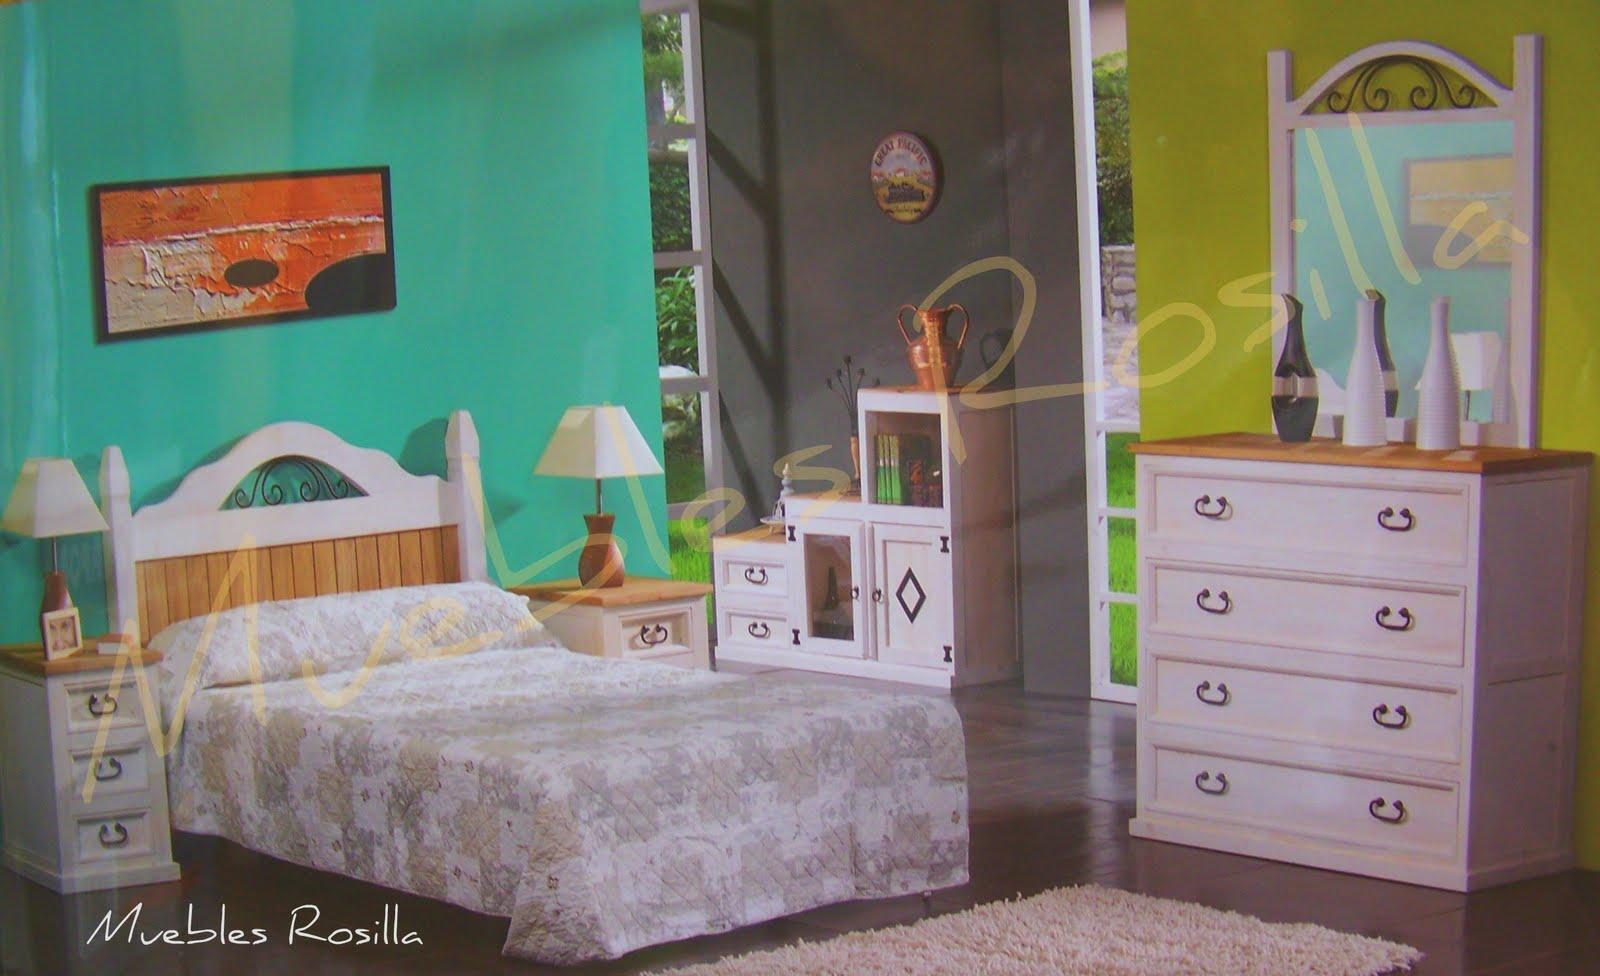 Muebles rosilla herv s dormitorio juvenil de forja for Muebles hervas